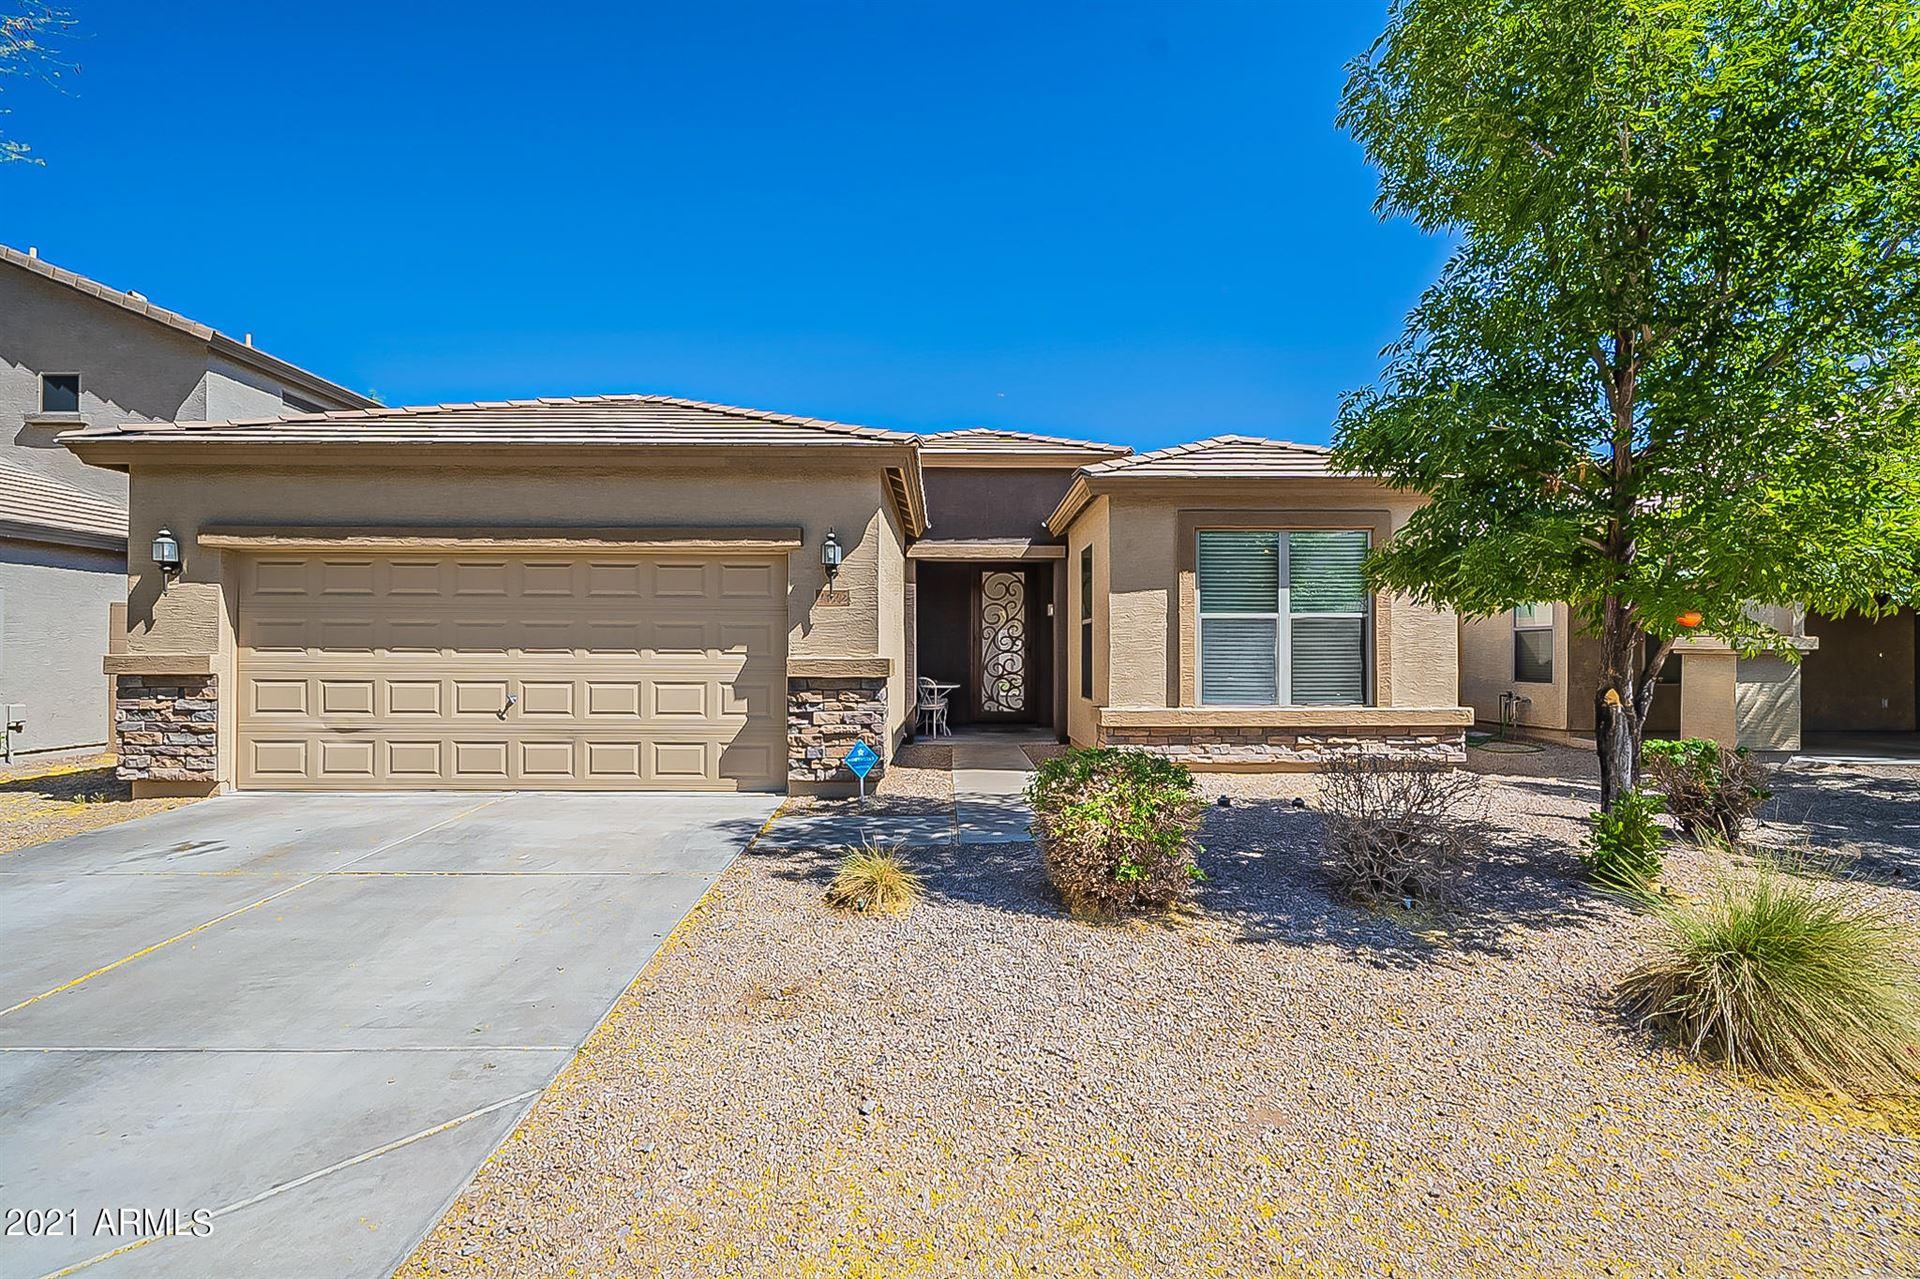 Photo of 4612 W BURGESS Lane, Laveen, AZ 85339 (MLS # 6227953)